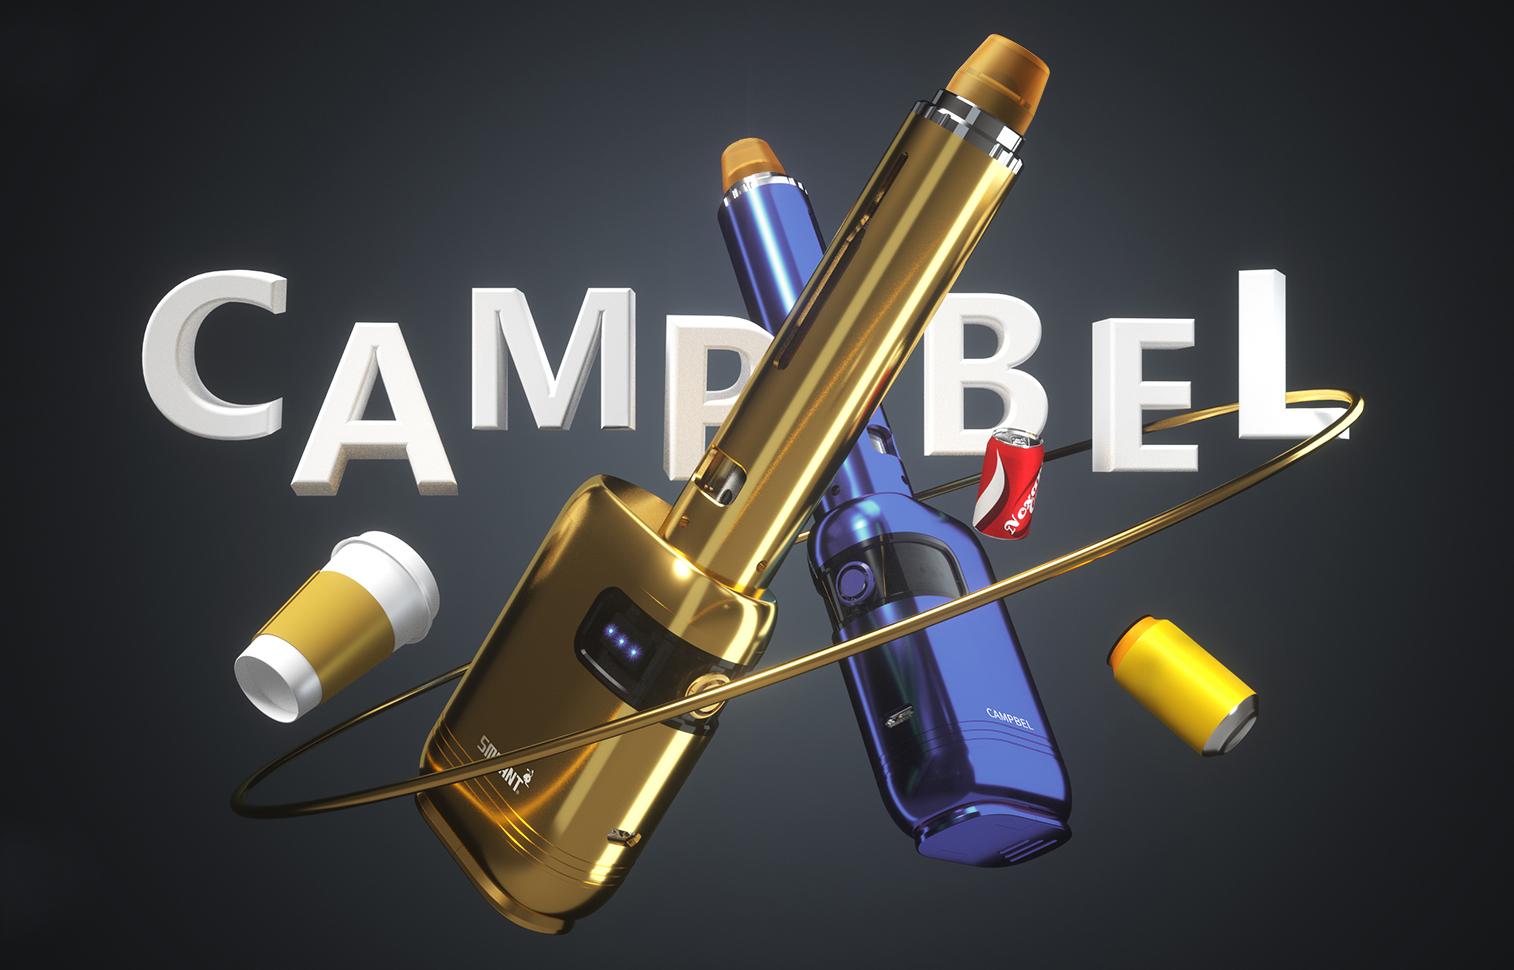 Smoant Campbel 80W Kit